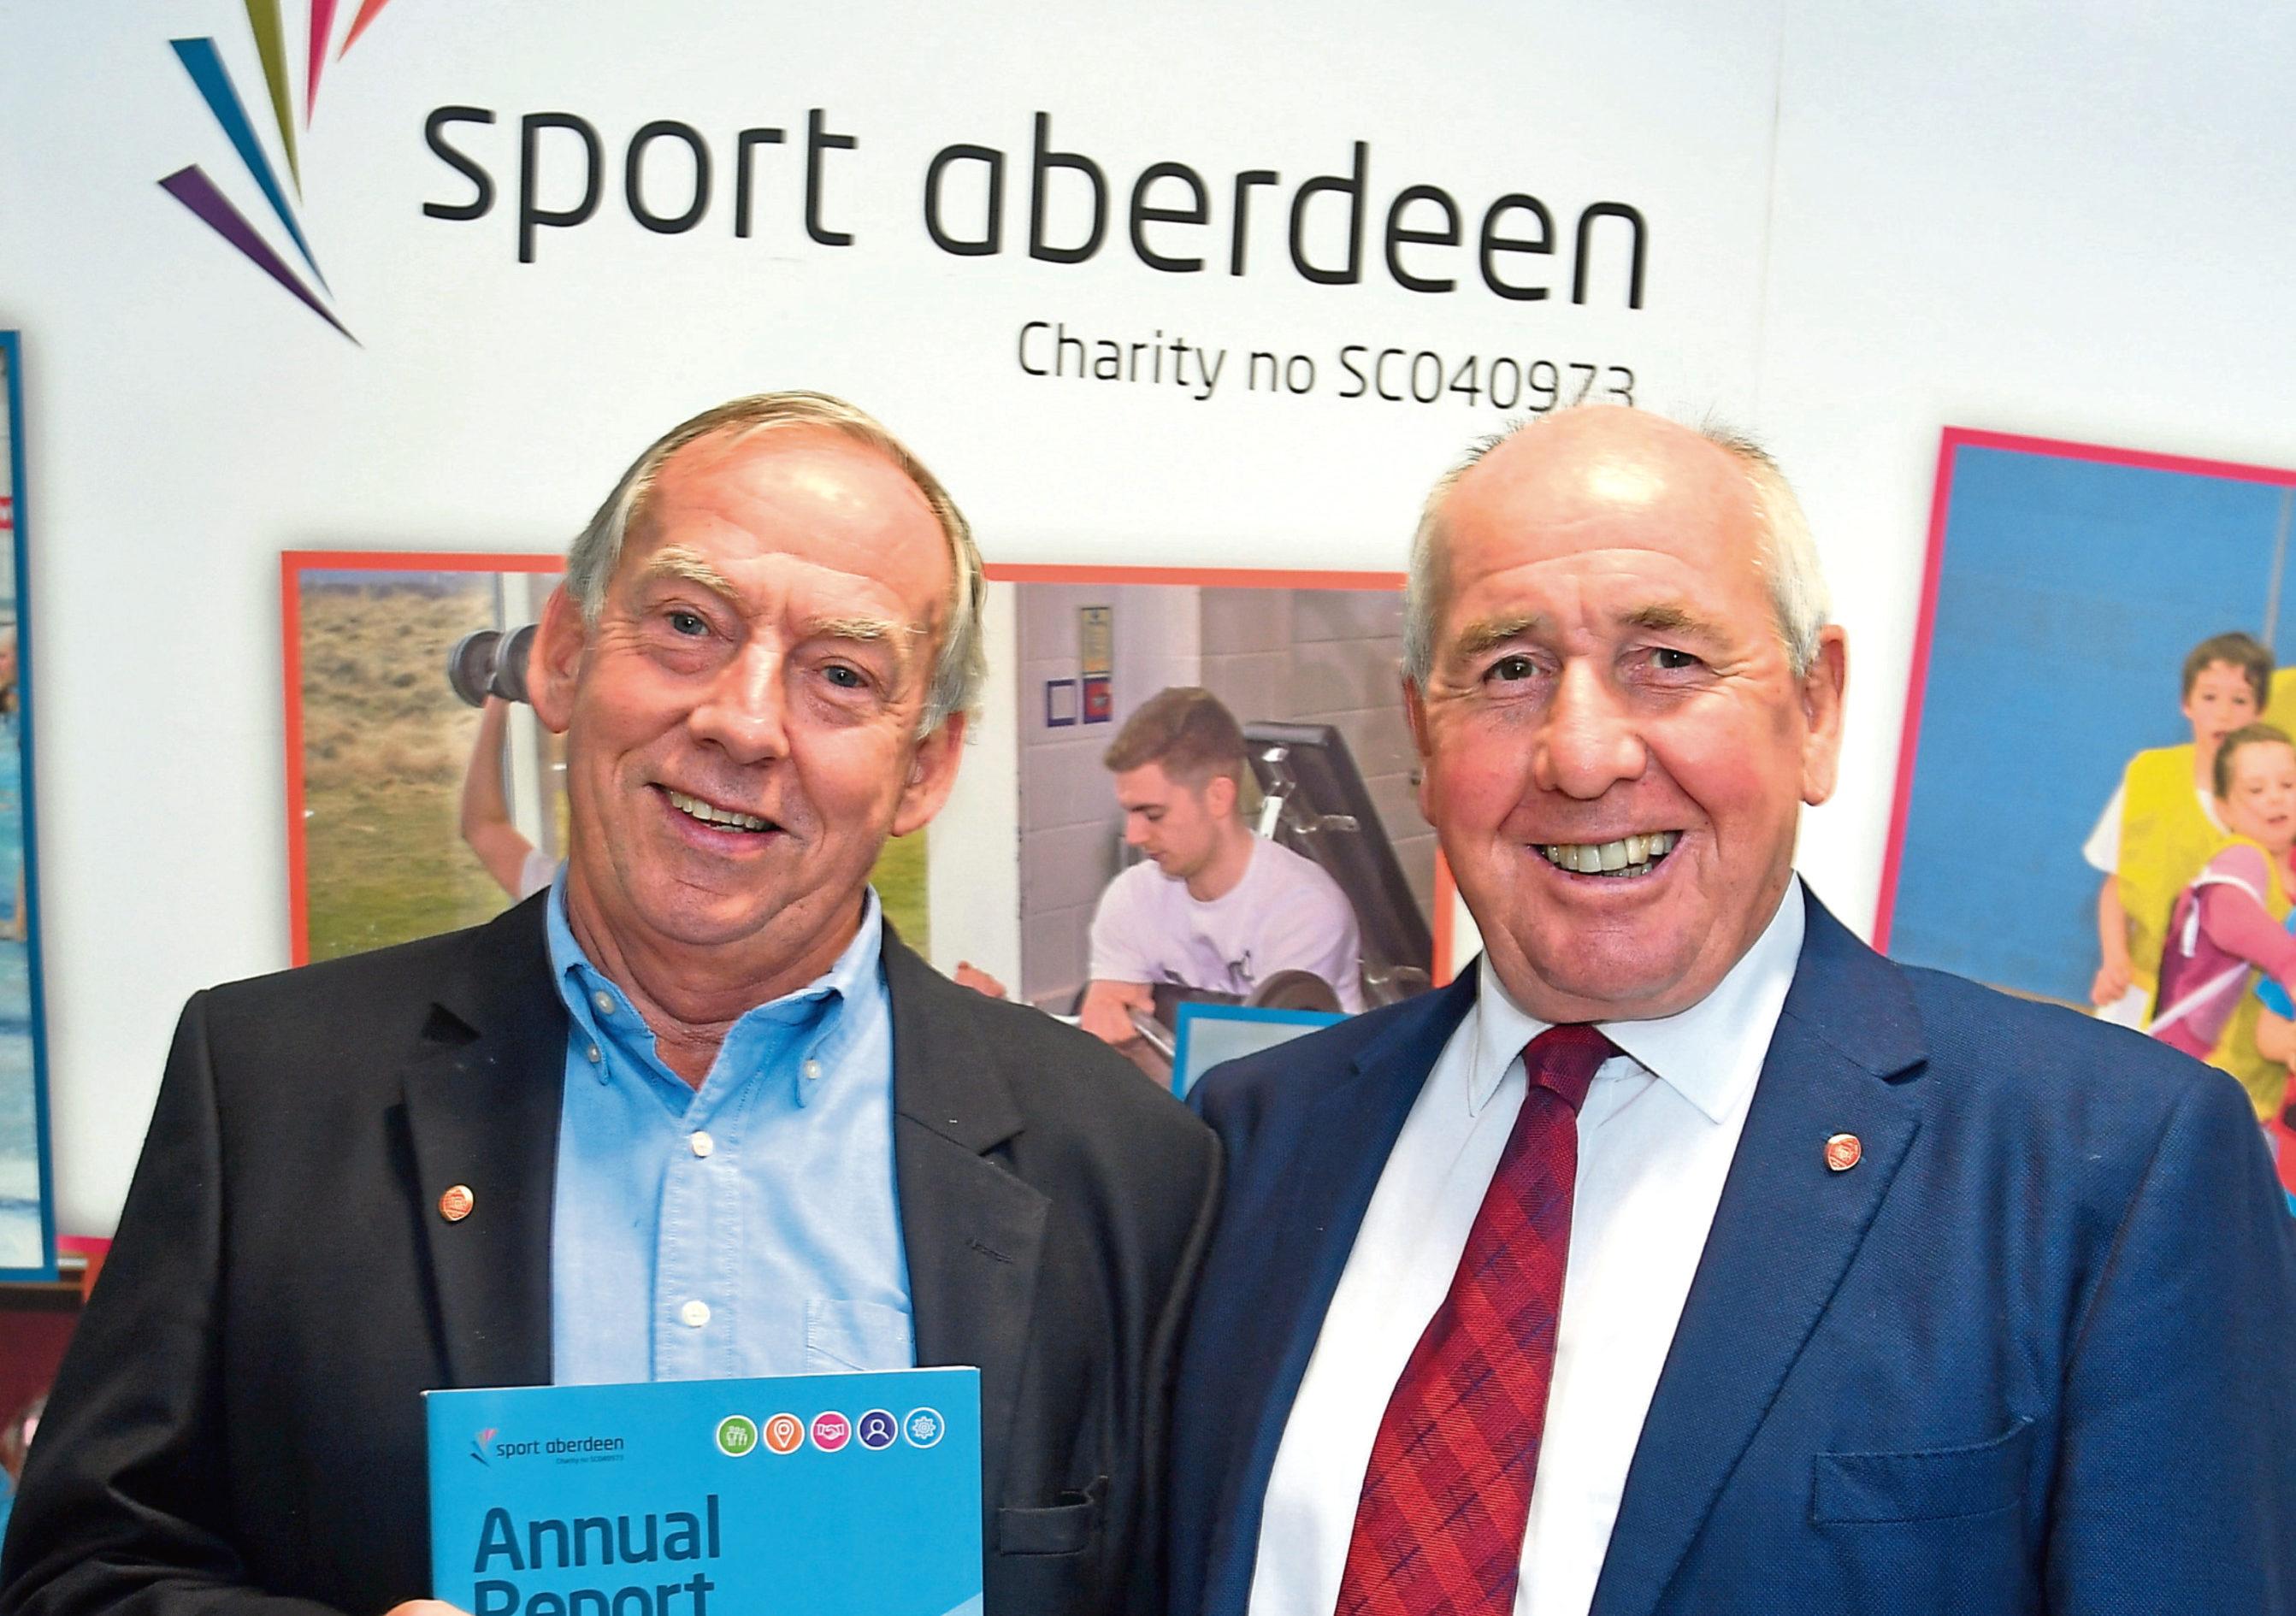 Tony Dawson, left, is SportAberdeen's new chairman